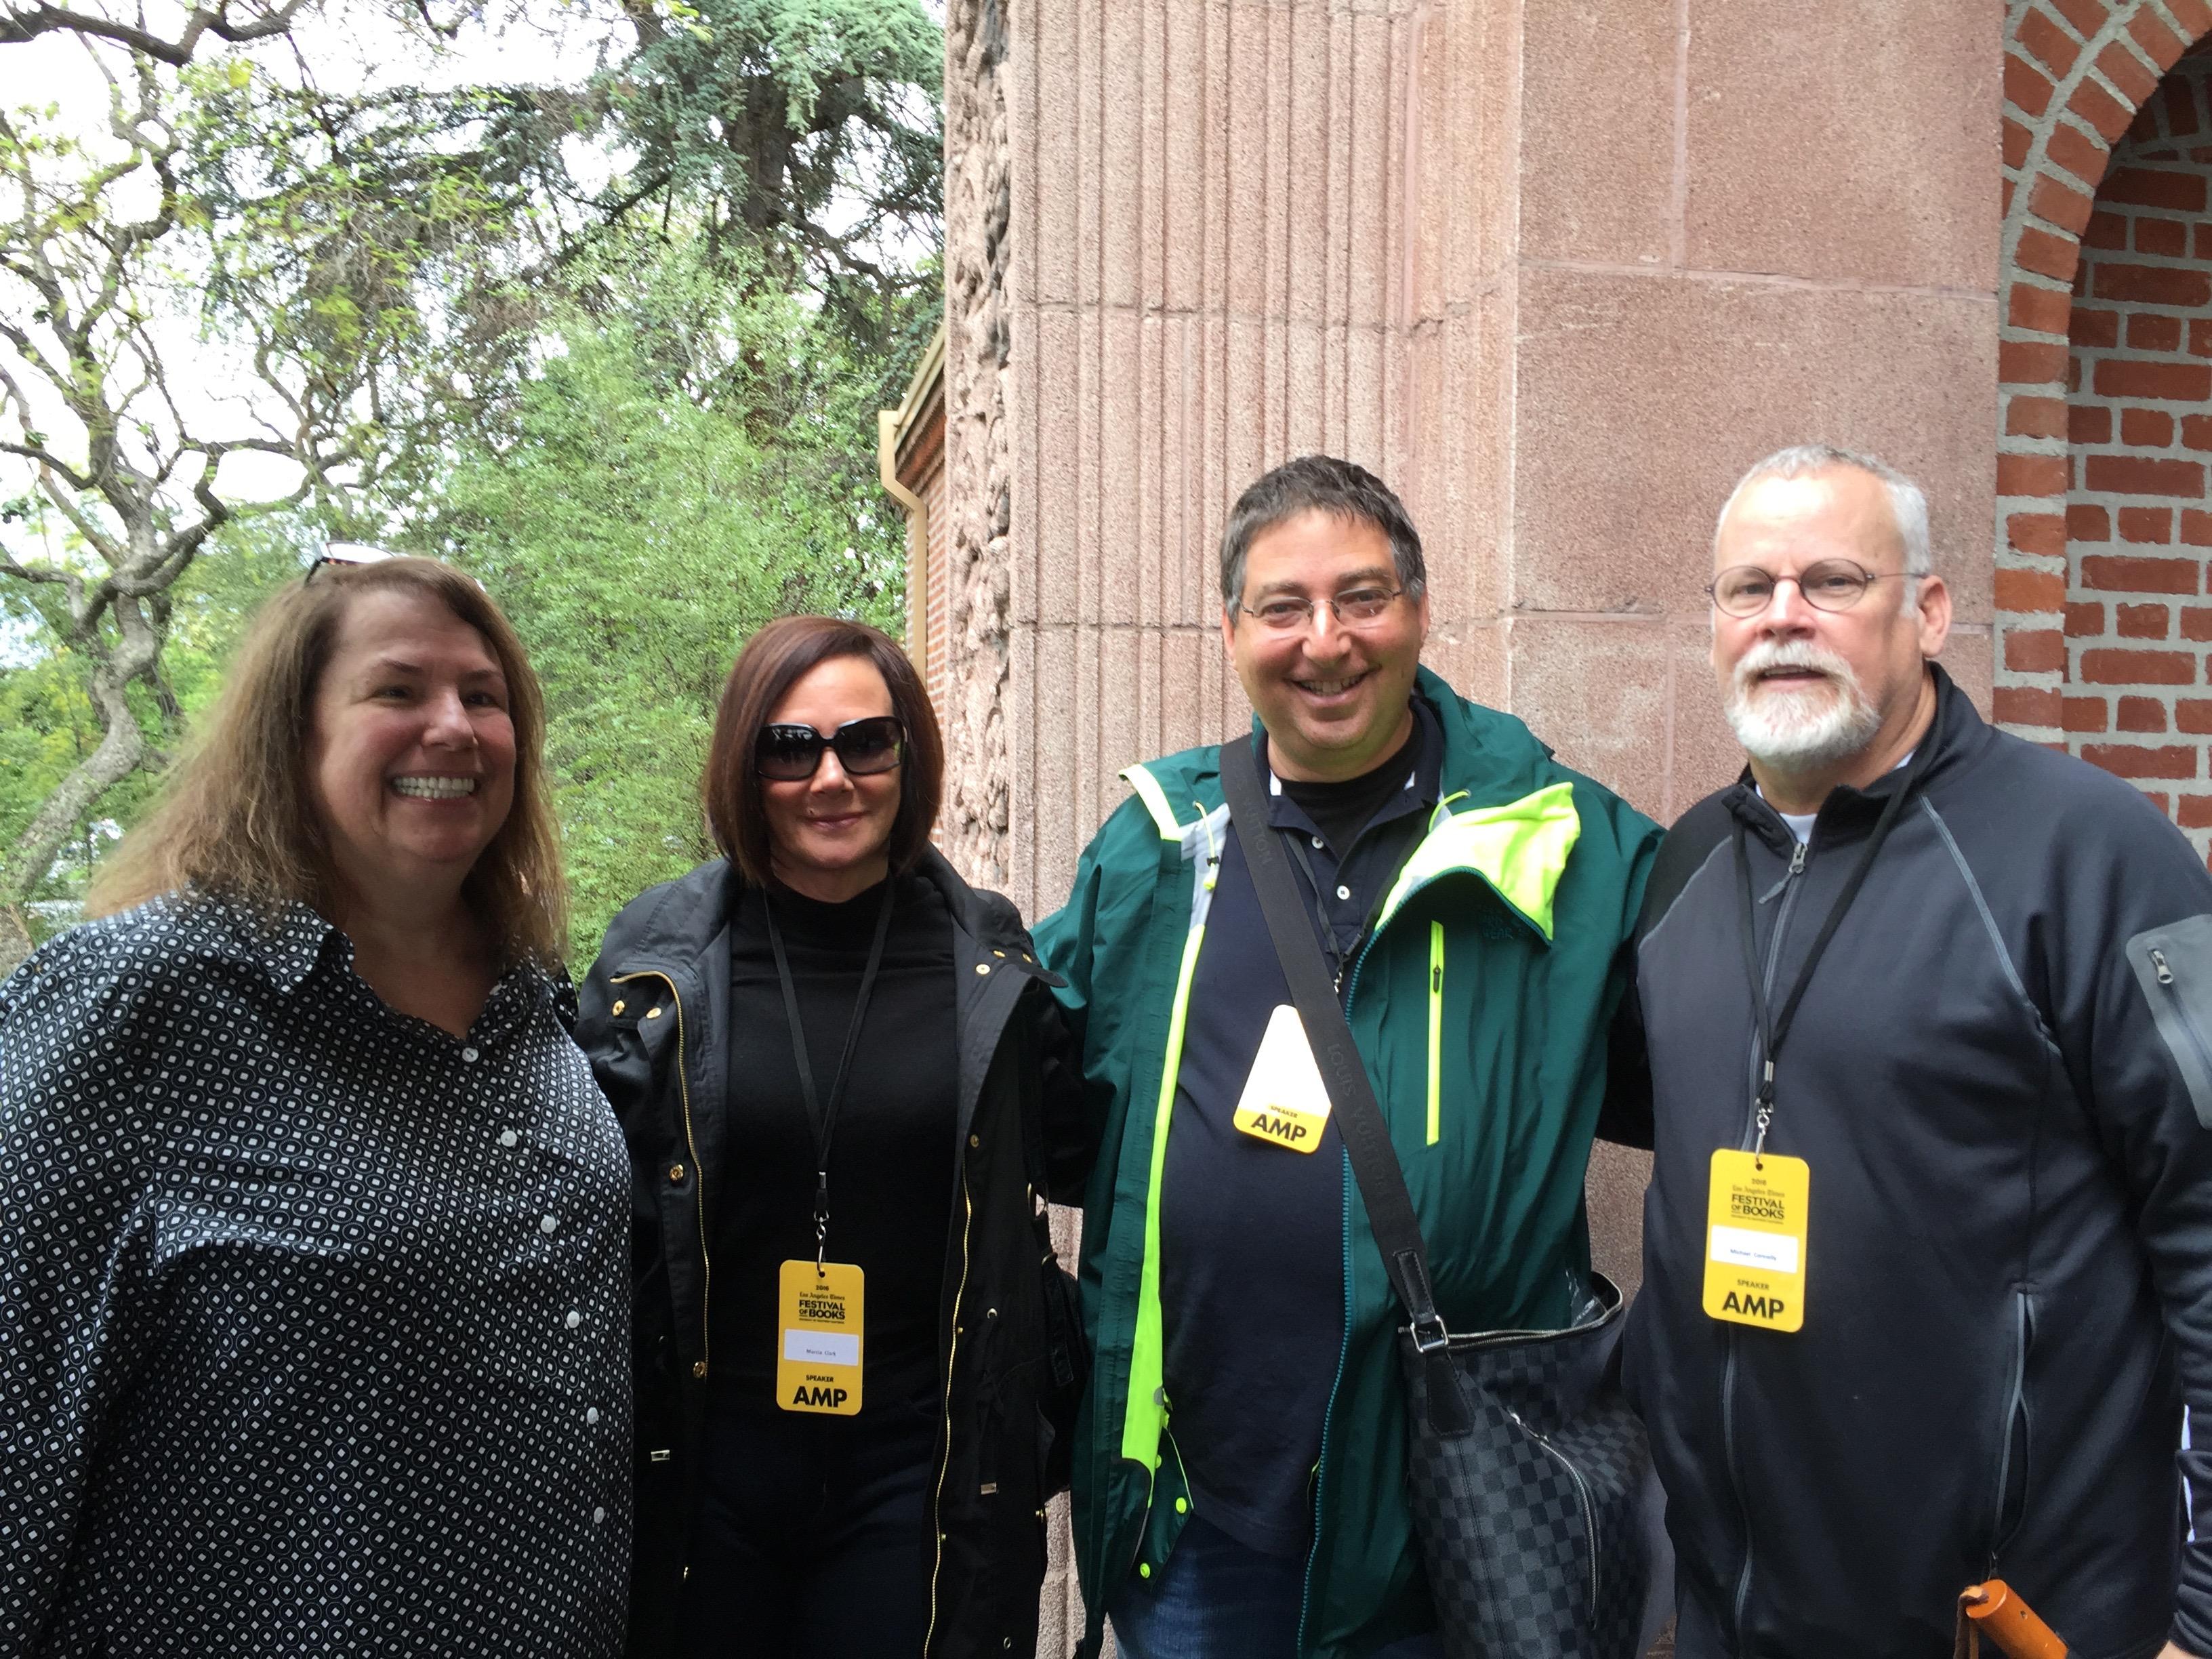 B&N Events coordinator Lita Weissman, Marcia Clark, me and Michael Connelly